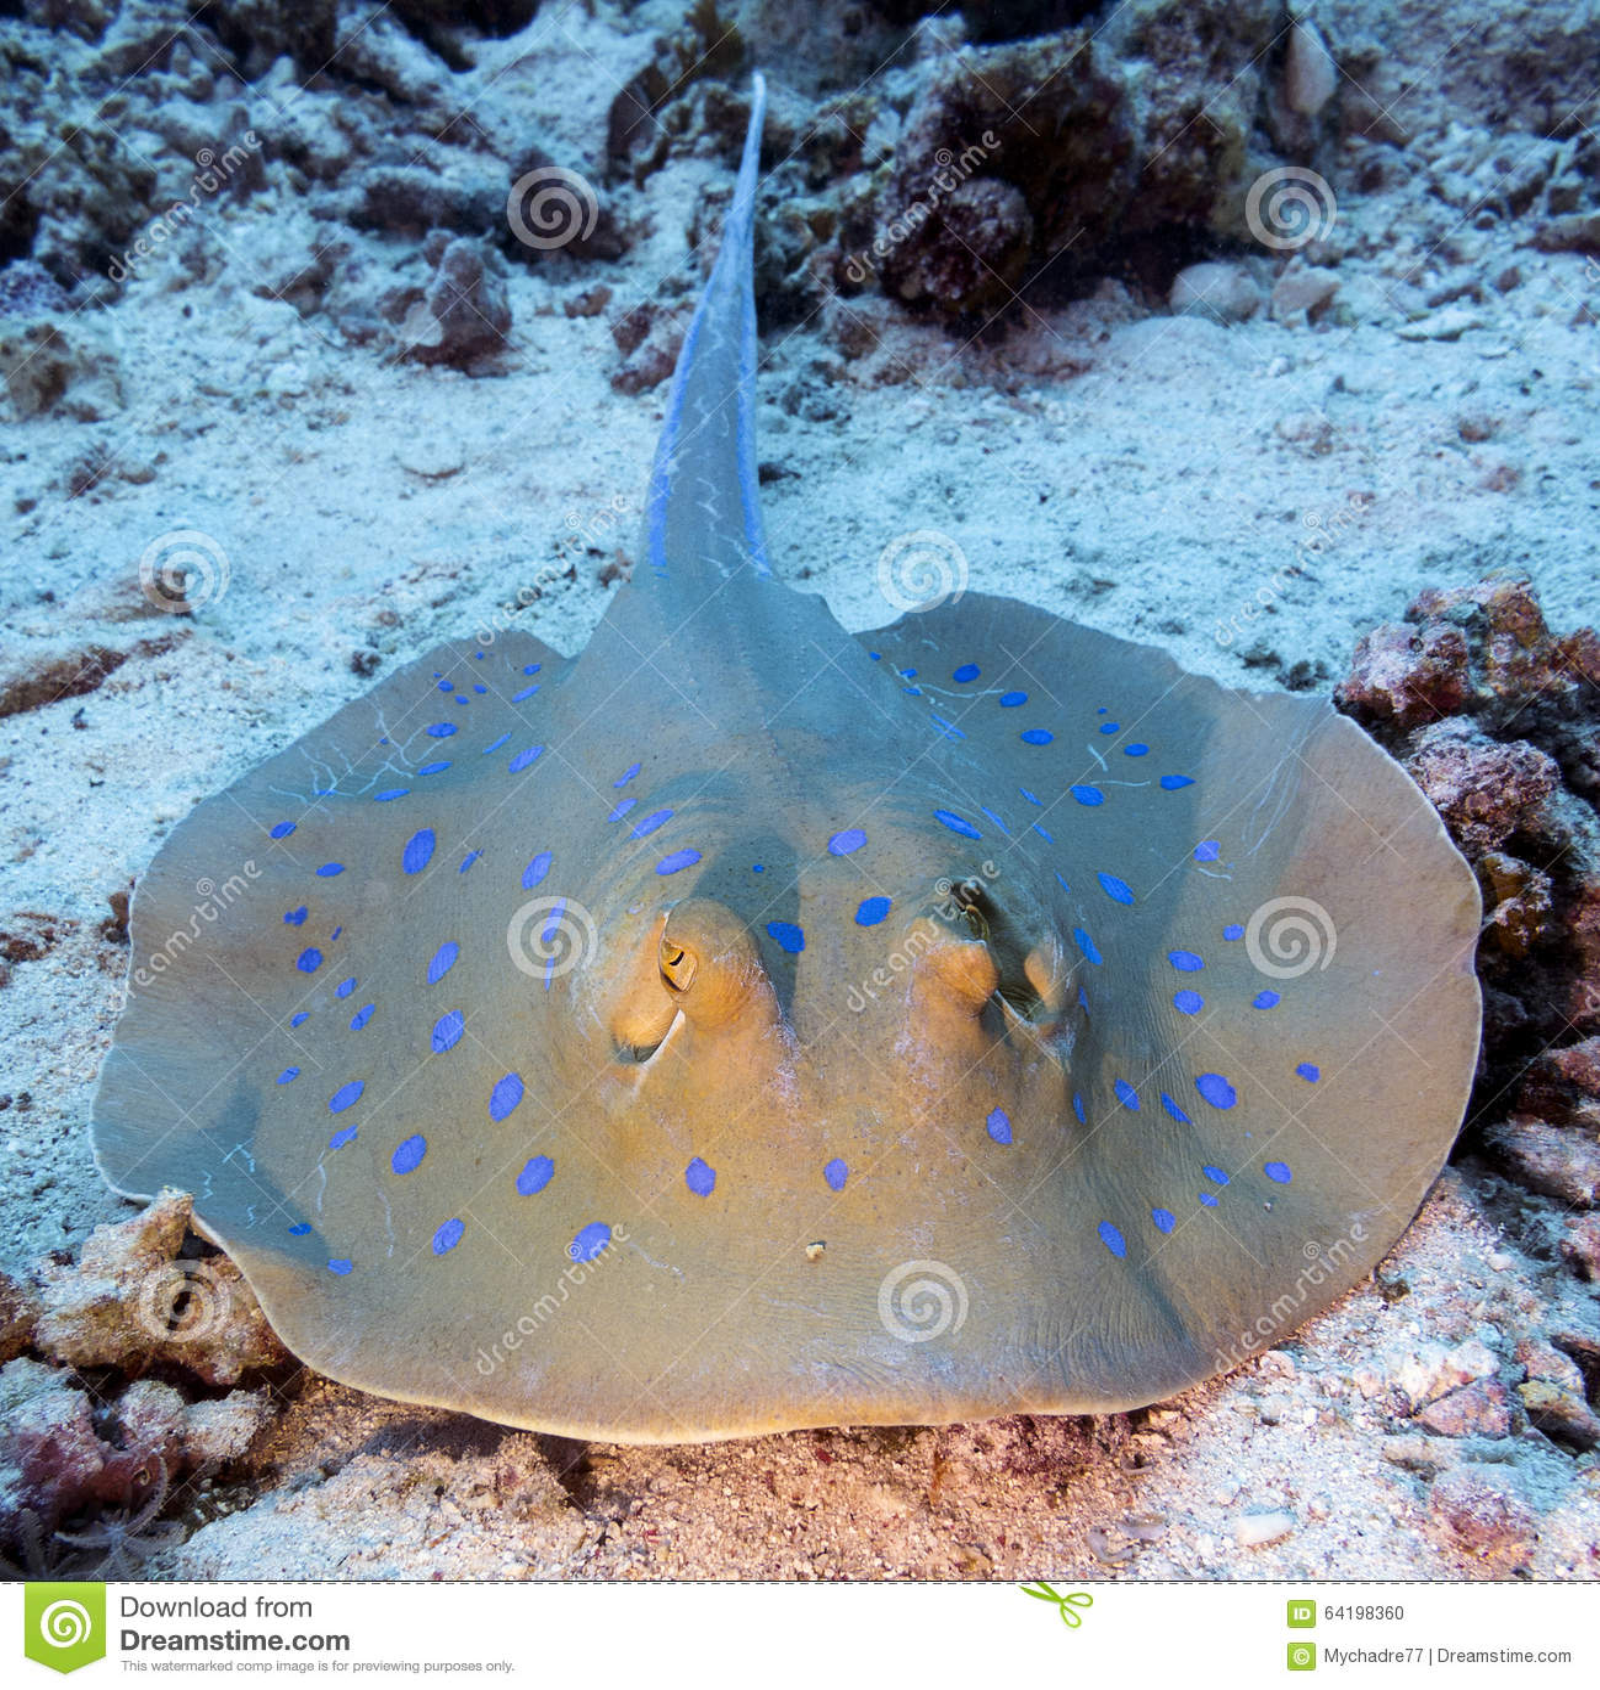 Bluespotted ray (Taeniura lymma) in tropical sea, underwater